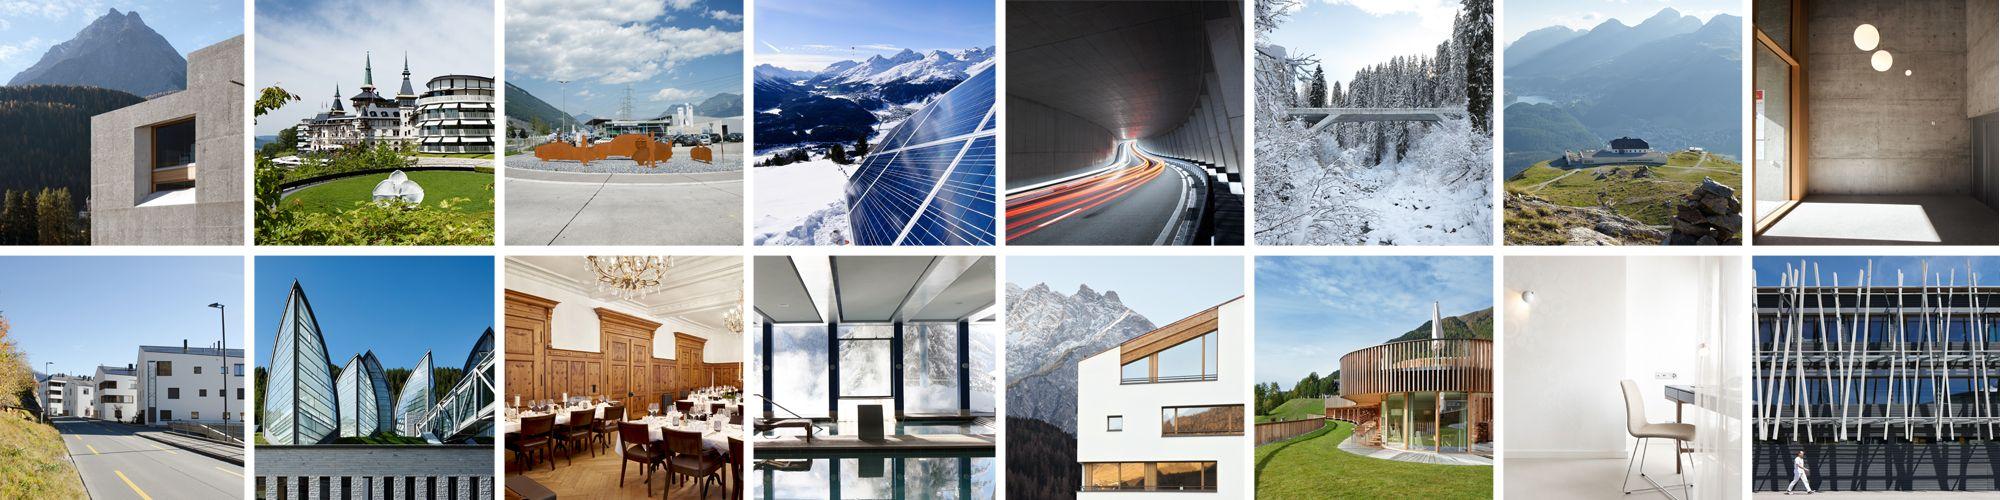 Fanzun AG  Architekten · Ingenieure · Berater